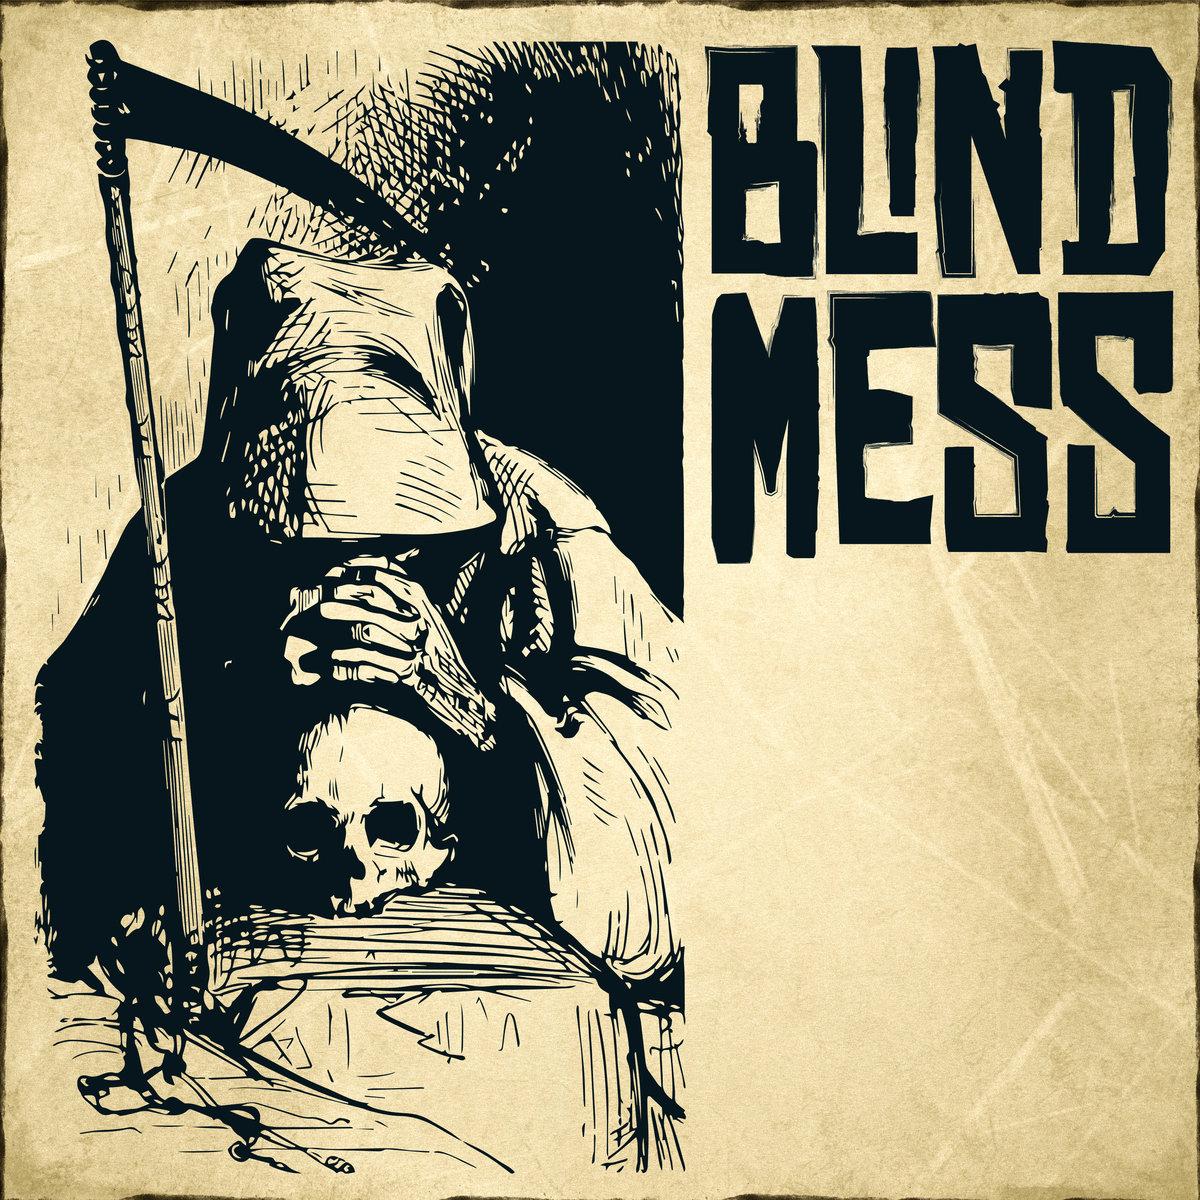 40. Blind Mess - Blind Mess